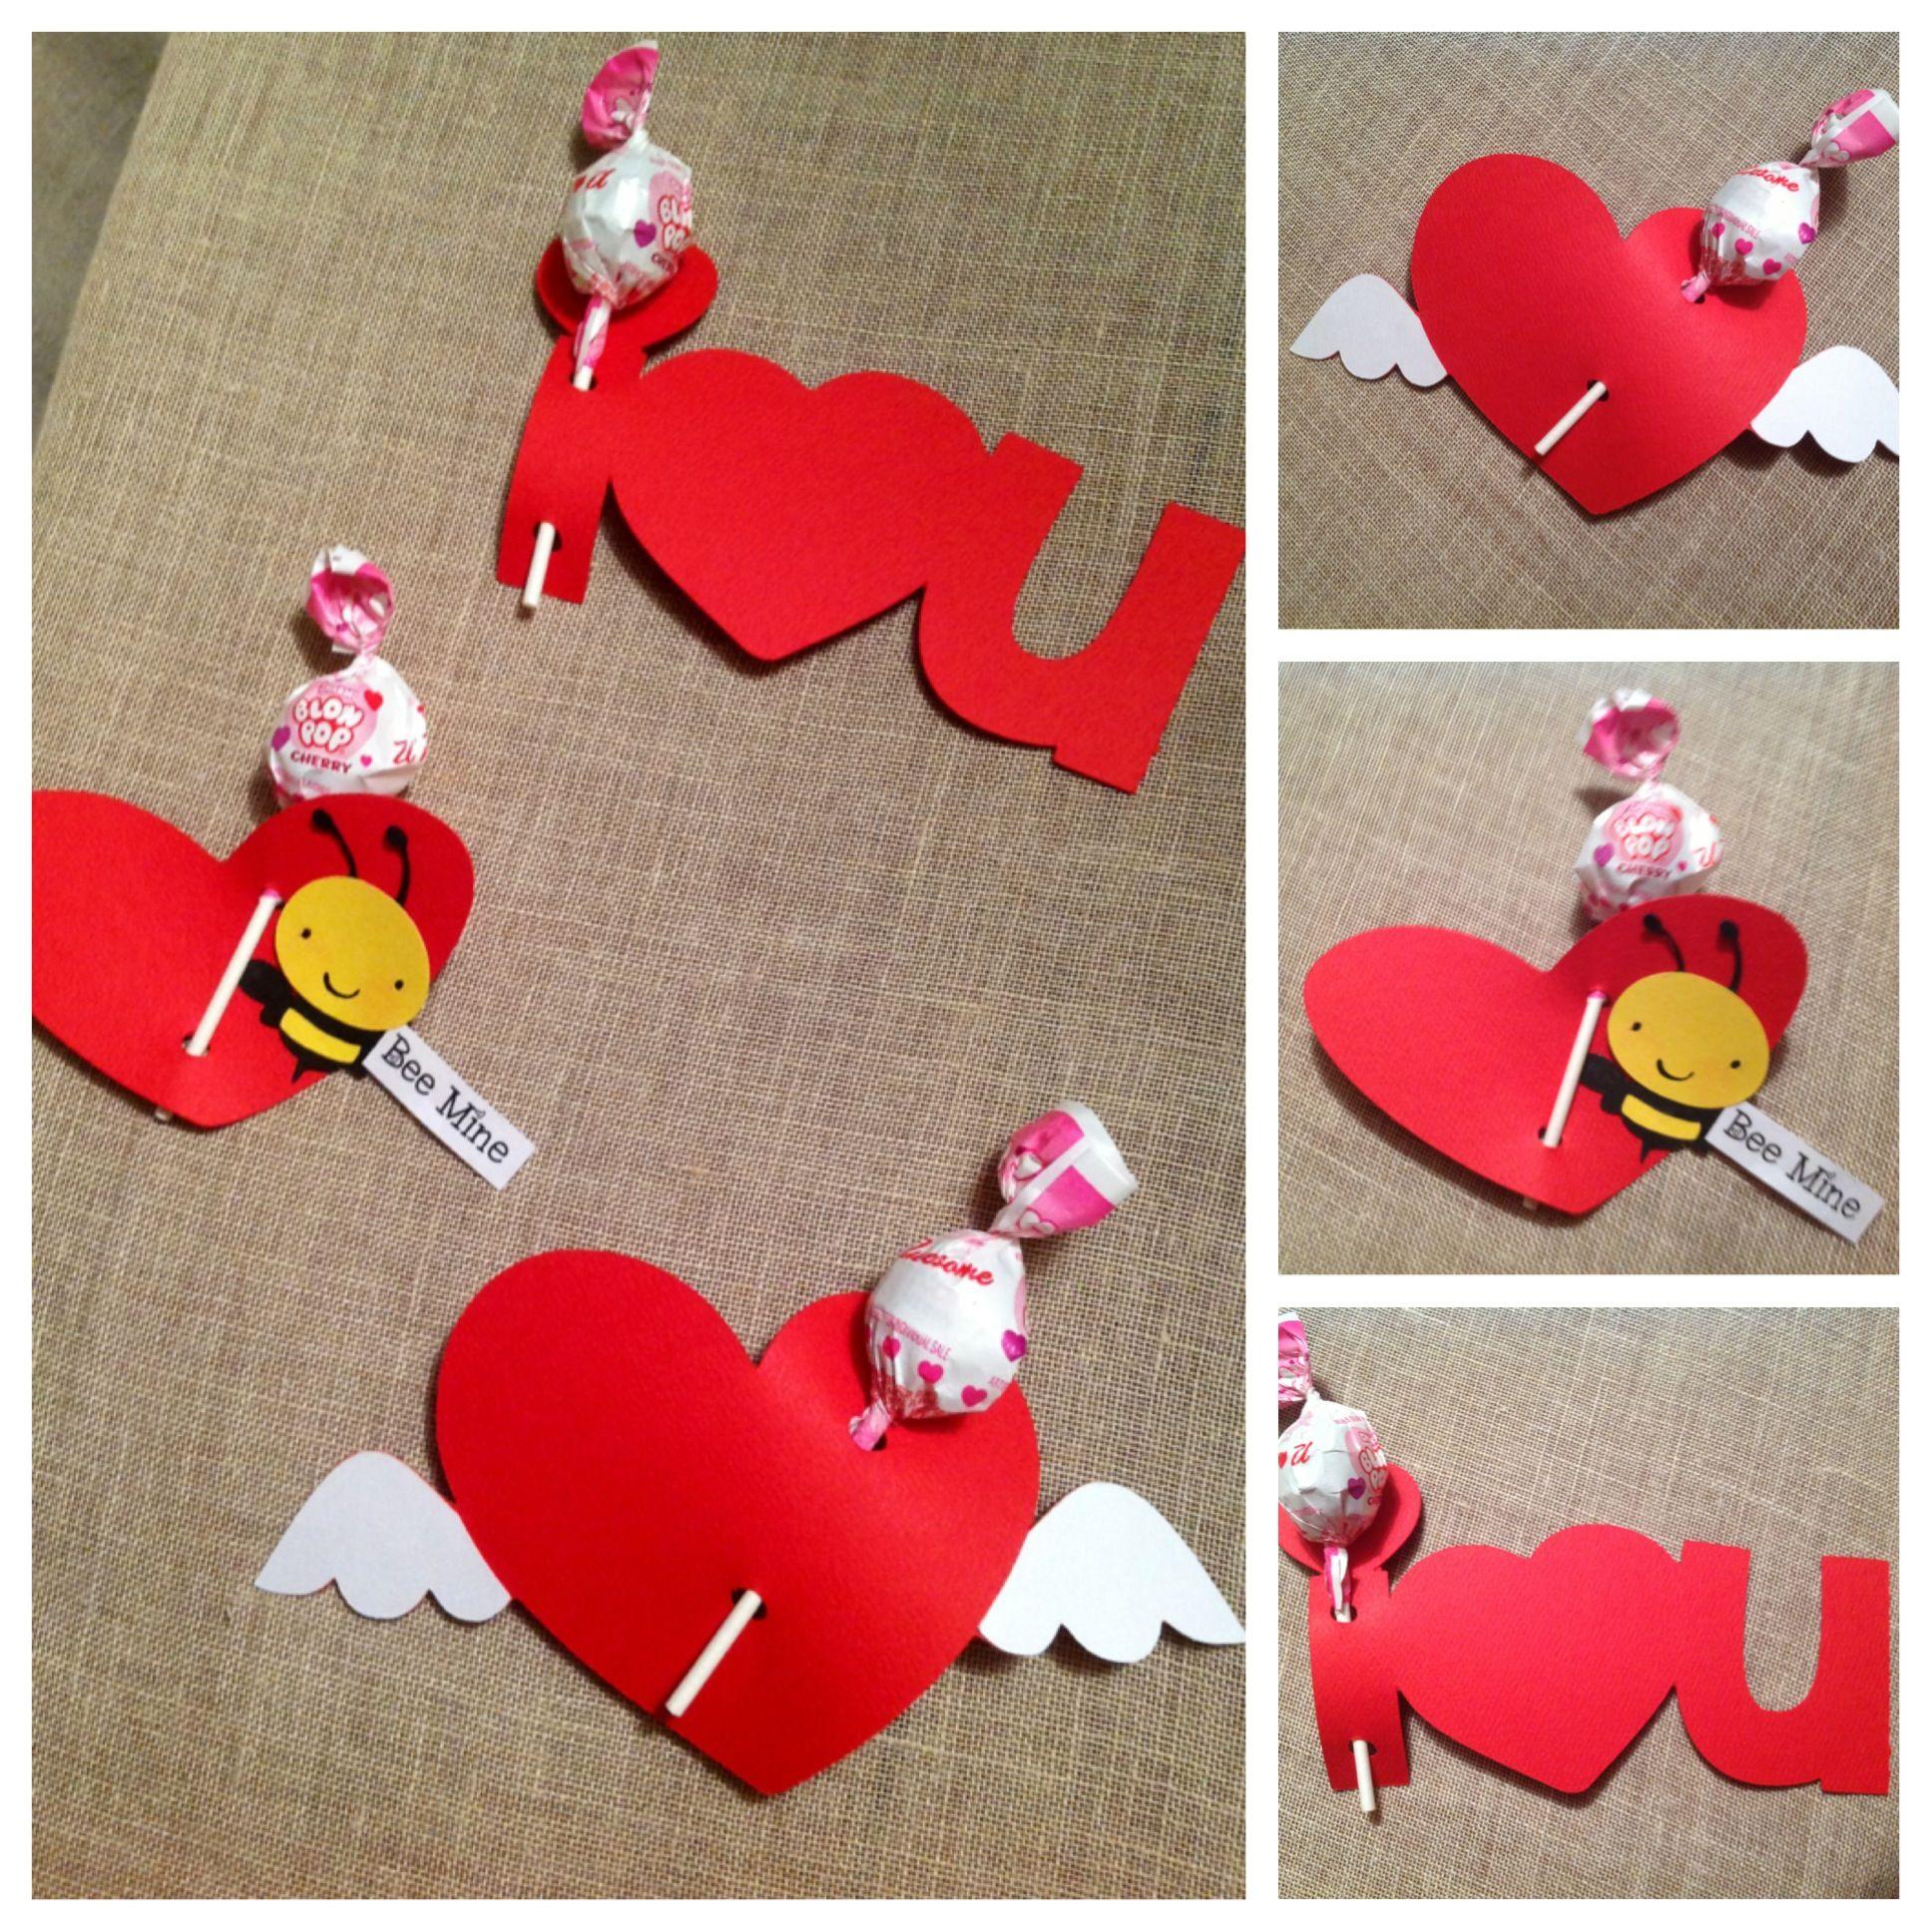 Candygram Fundraiser Cute Idea Valentine S Day Diy Valentine S Day Candy Classroom Valentines Diy Valentine Crafts For Kids Fundraiser Valentines